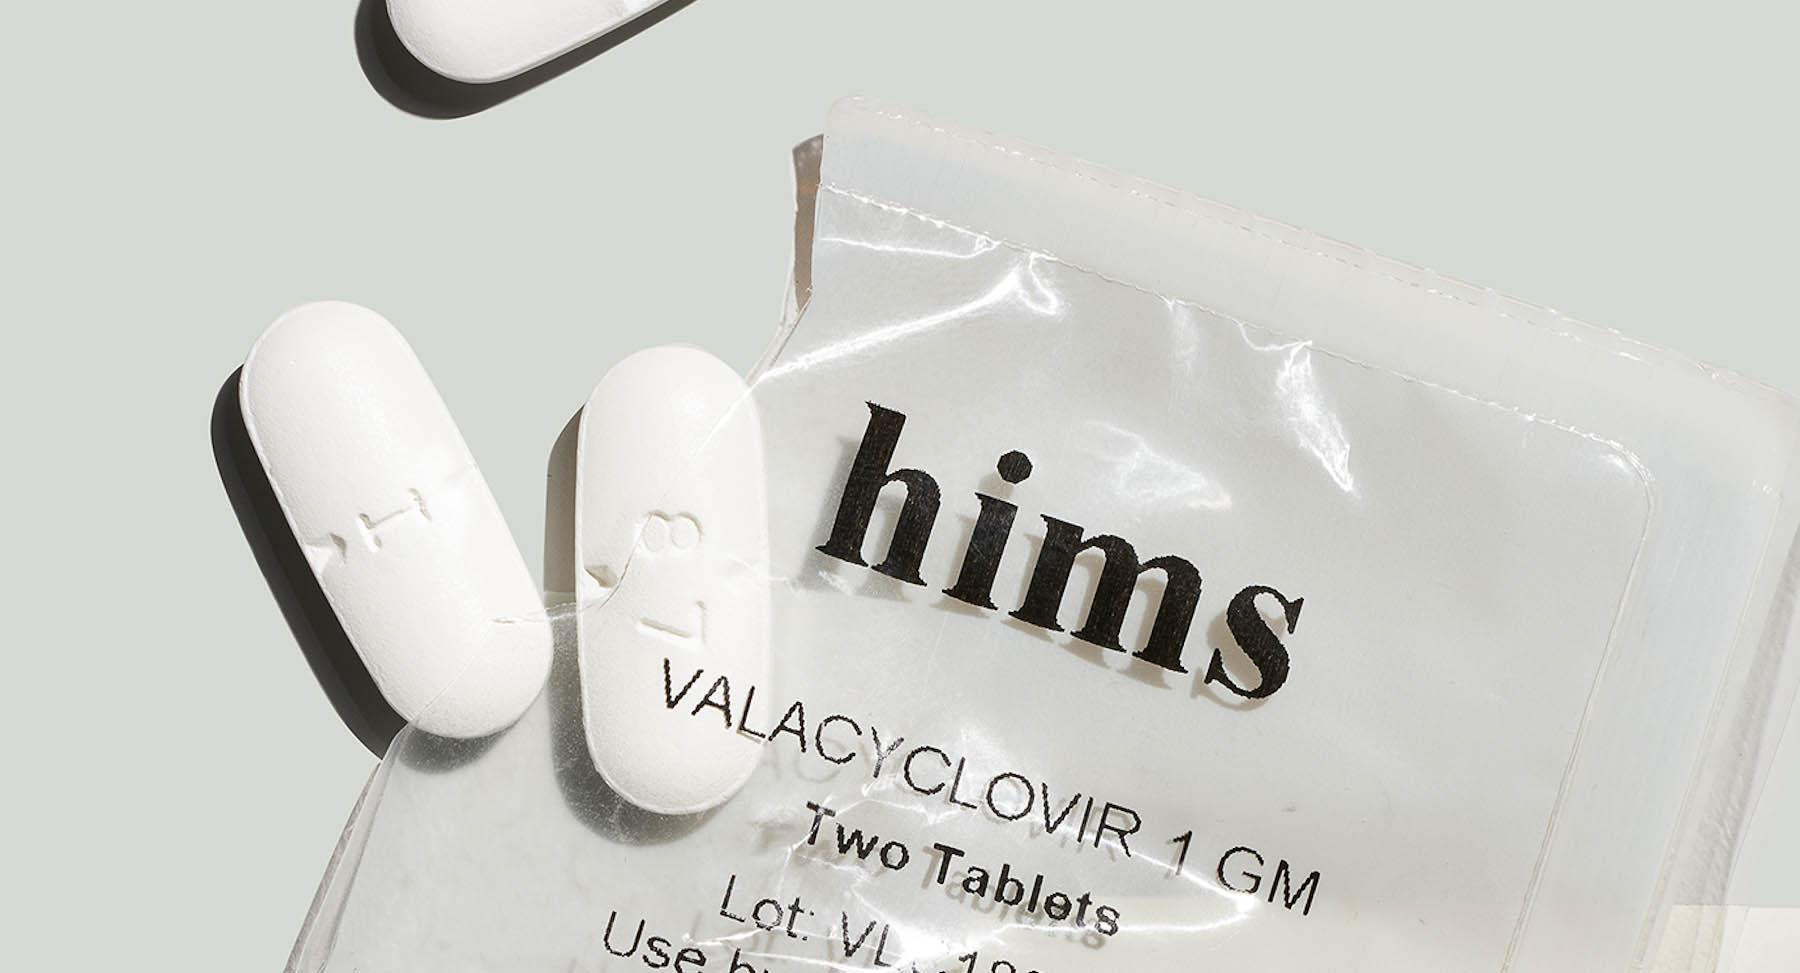 Valacyclovir vs. Alternative Herpes Treatments: Which is Best?